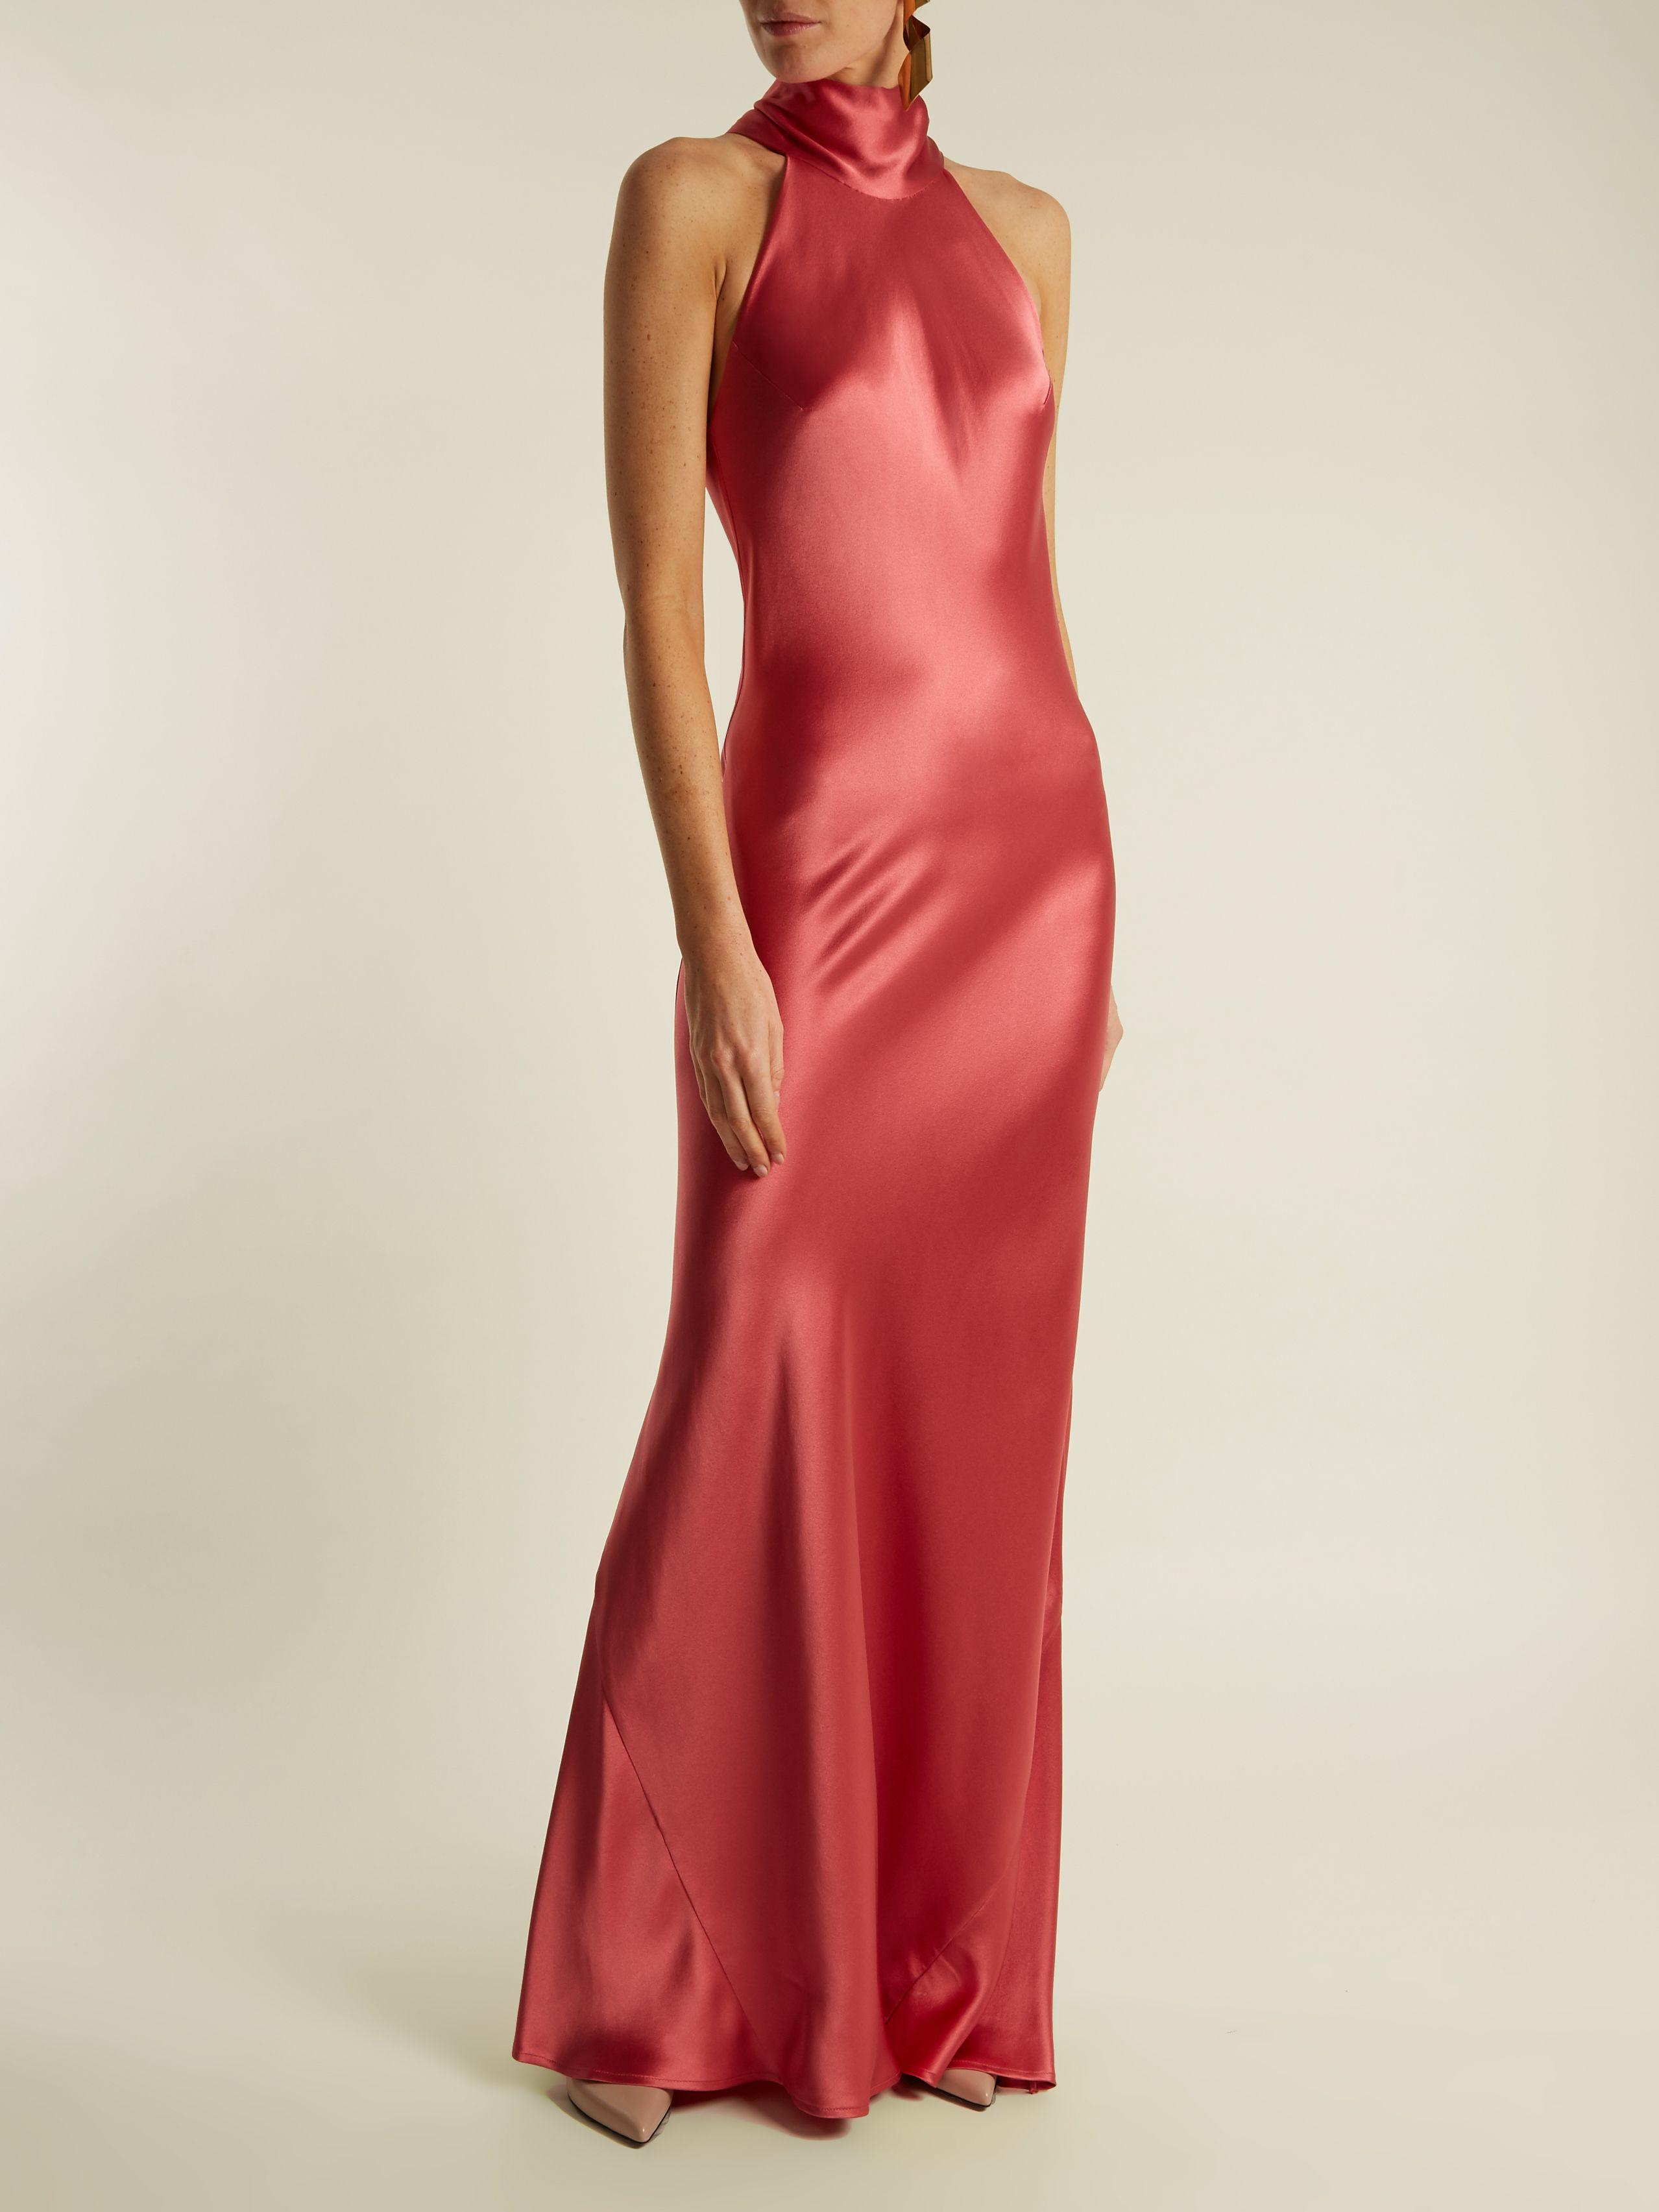 Latest Galvan Pink Silk Halterneck Evening Dress For Women Selling Well